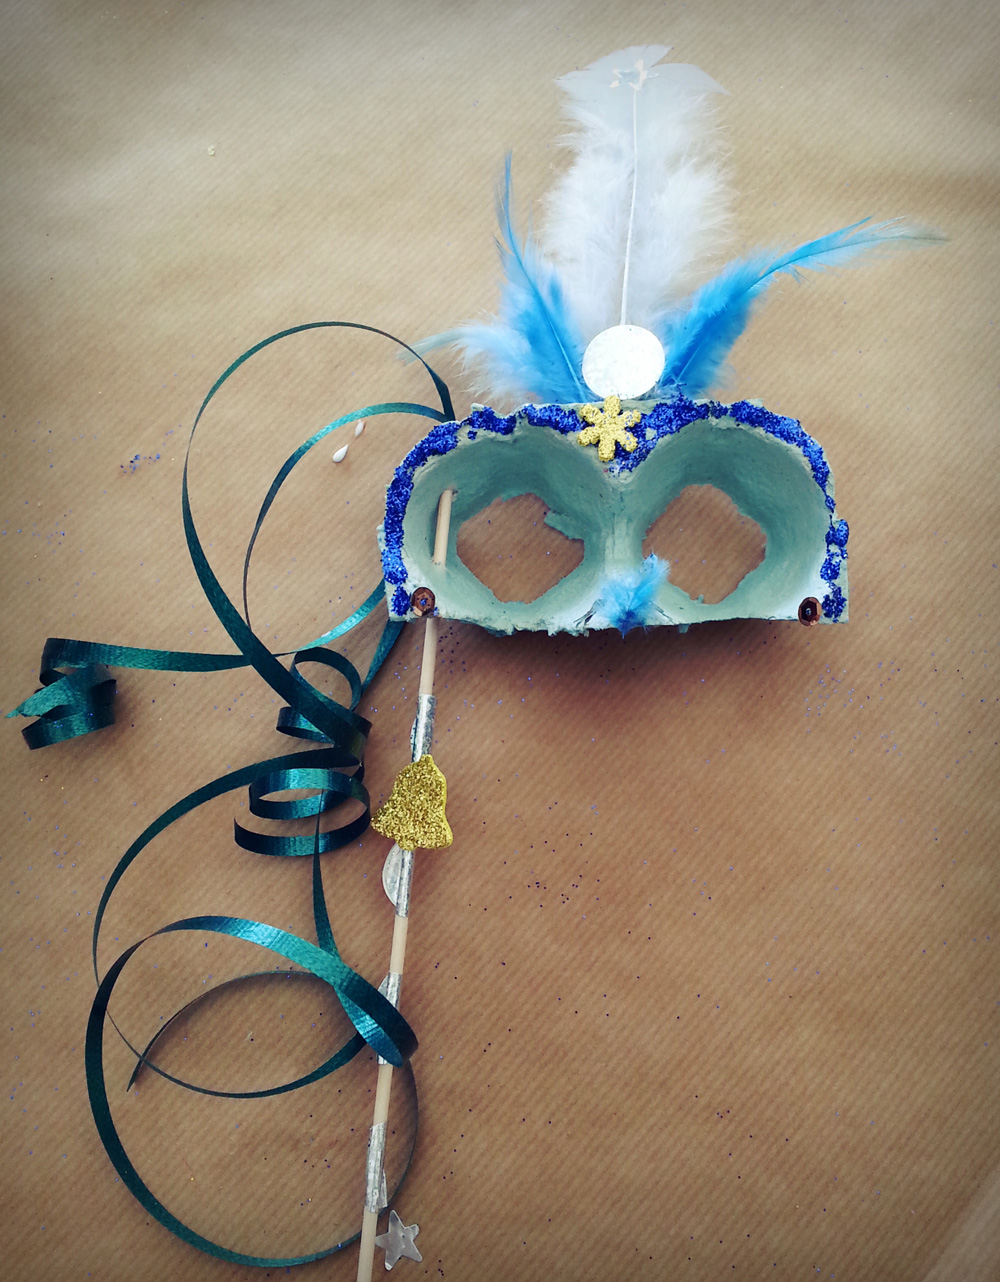 Taller de màscares venecianes Carnestoltes